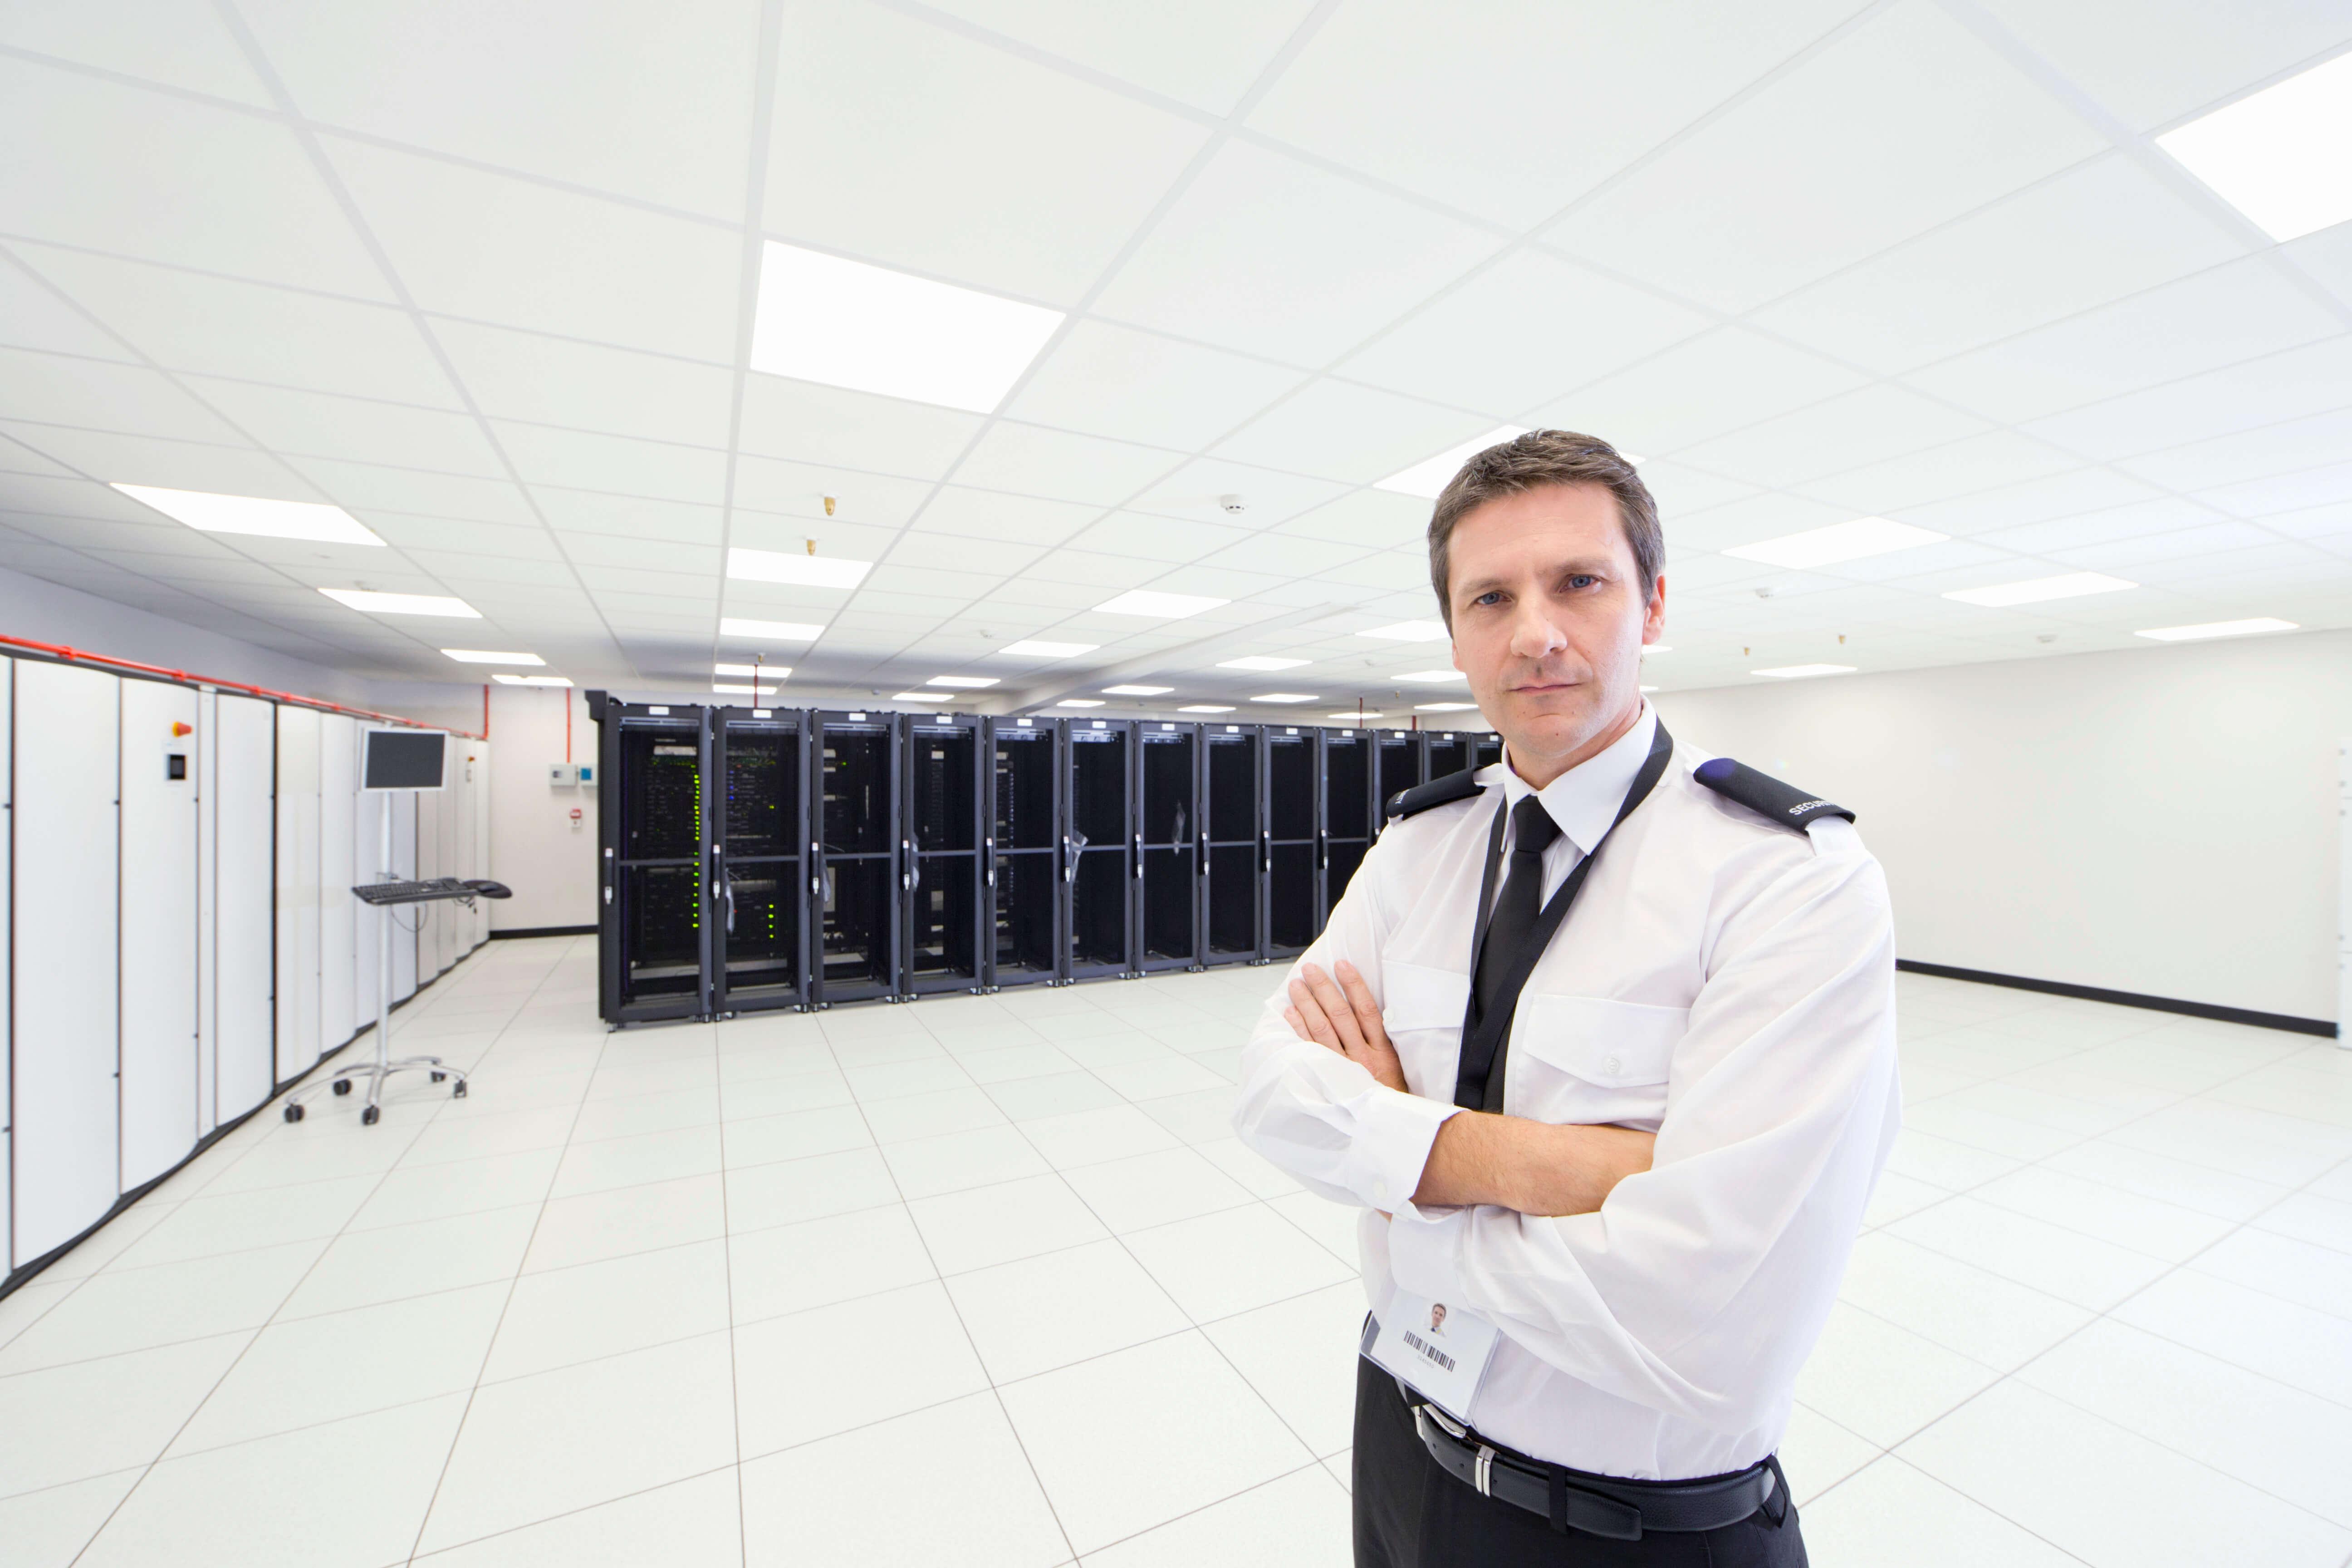 Data centre security officer - iomart